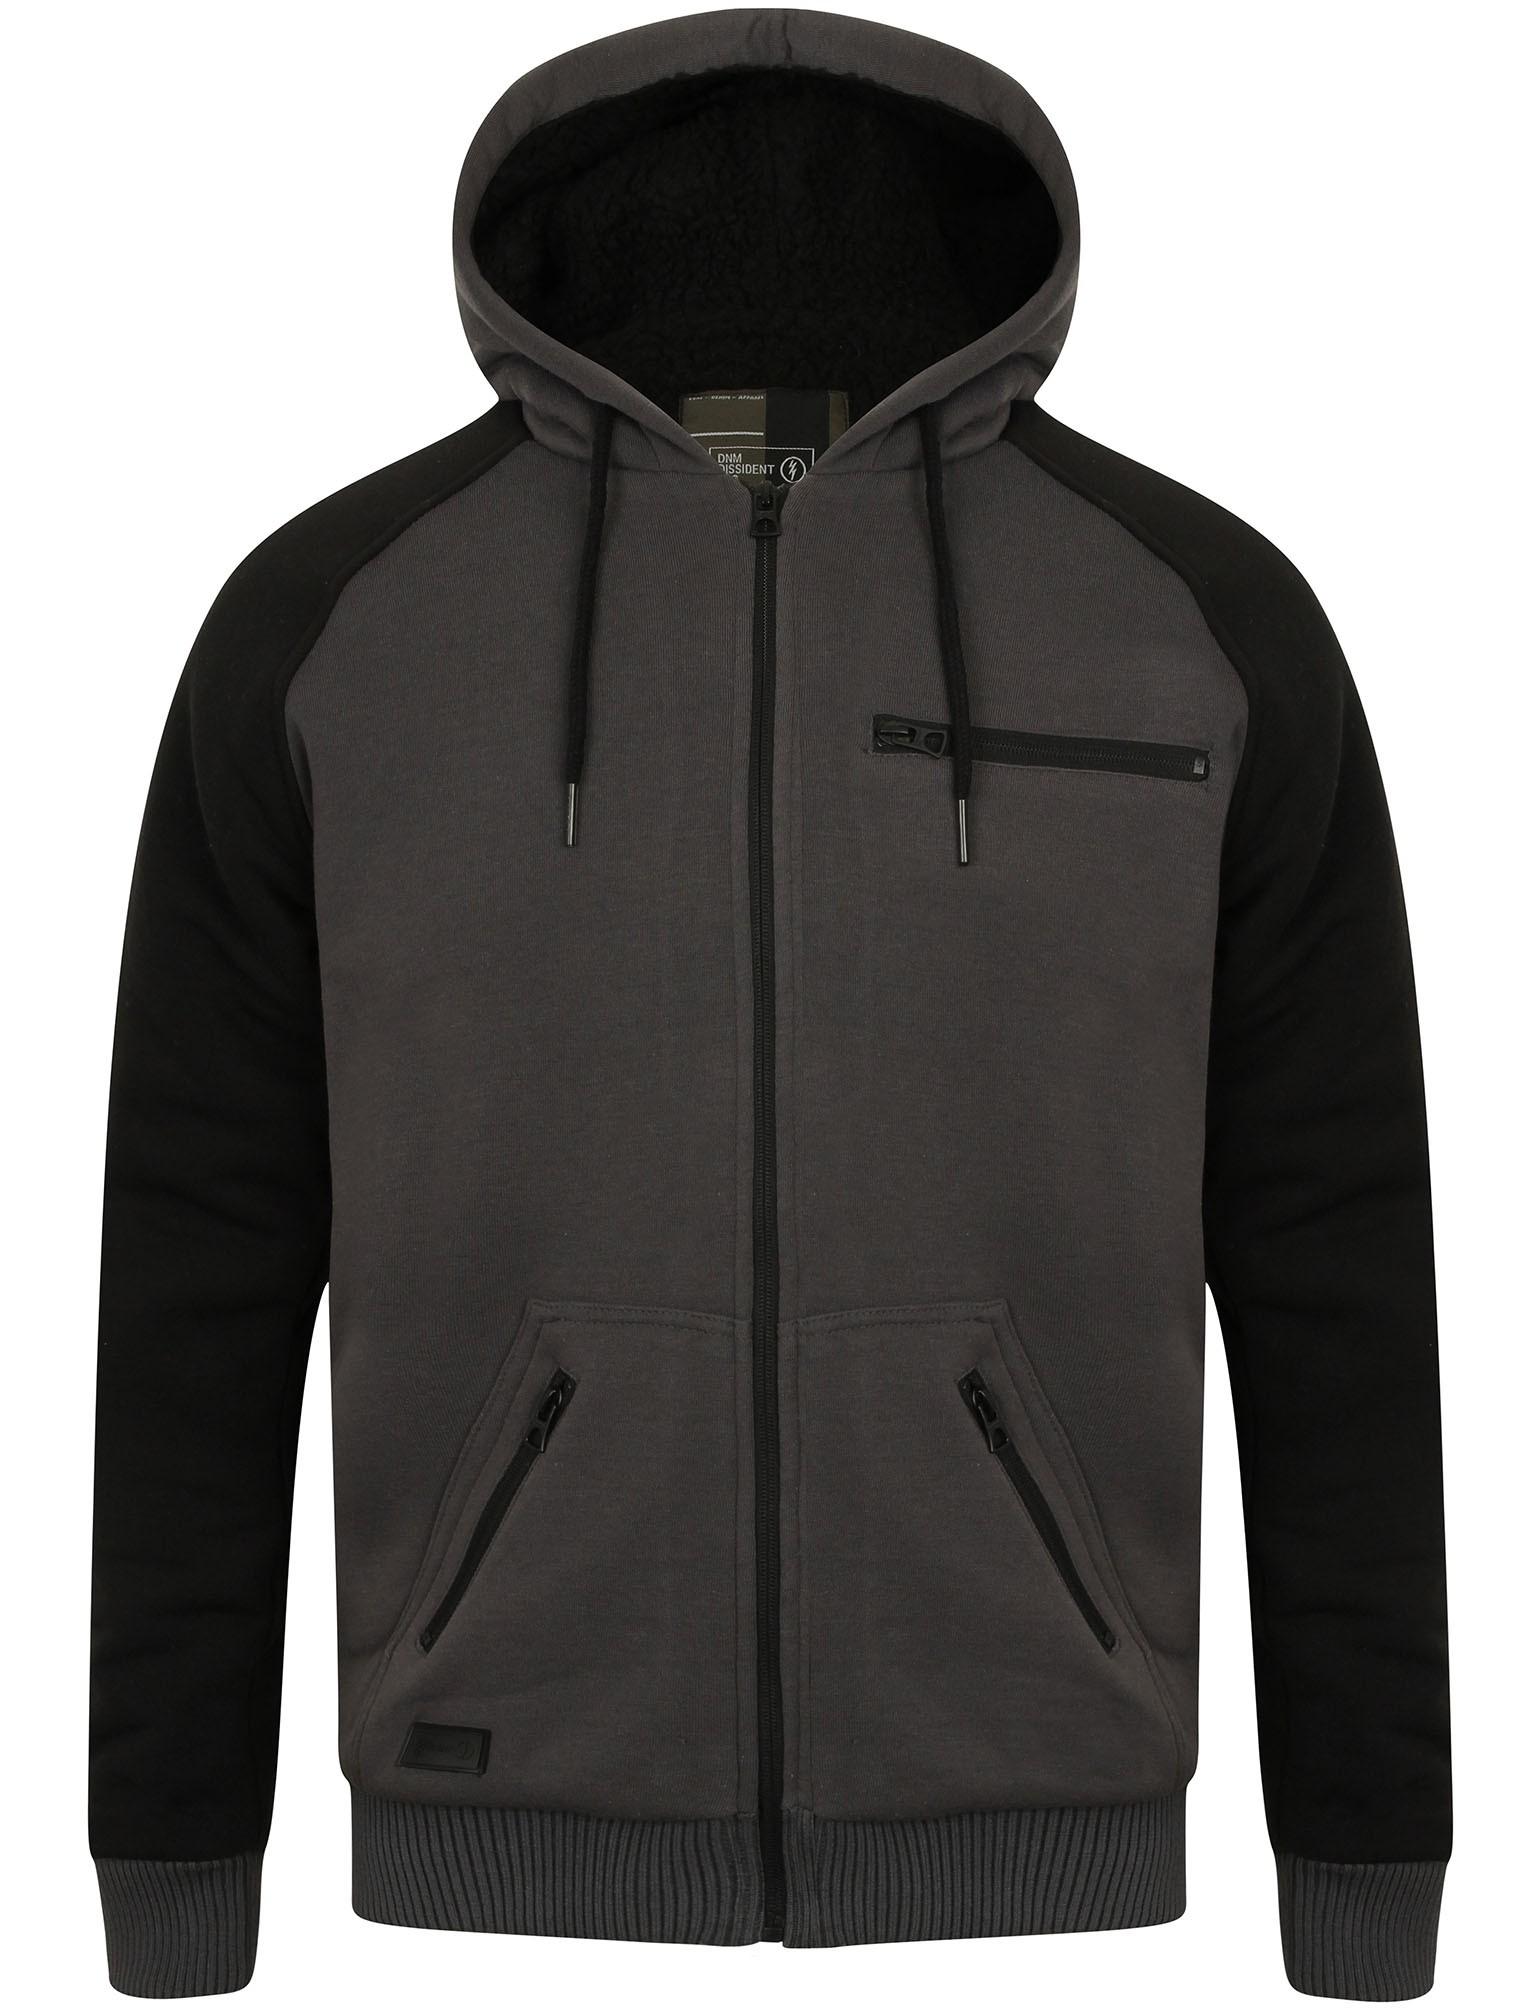 Borg Lined Hoodie + Joggers w/c £24.99 - Baughman Wool Blend Coat w/c £17.99  @ Tokyo Laundry